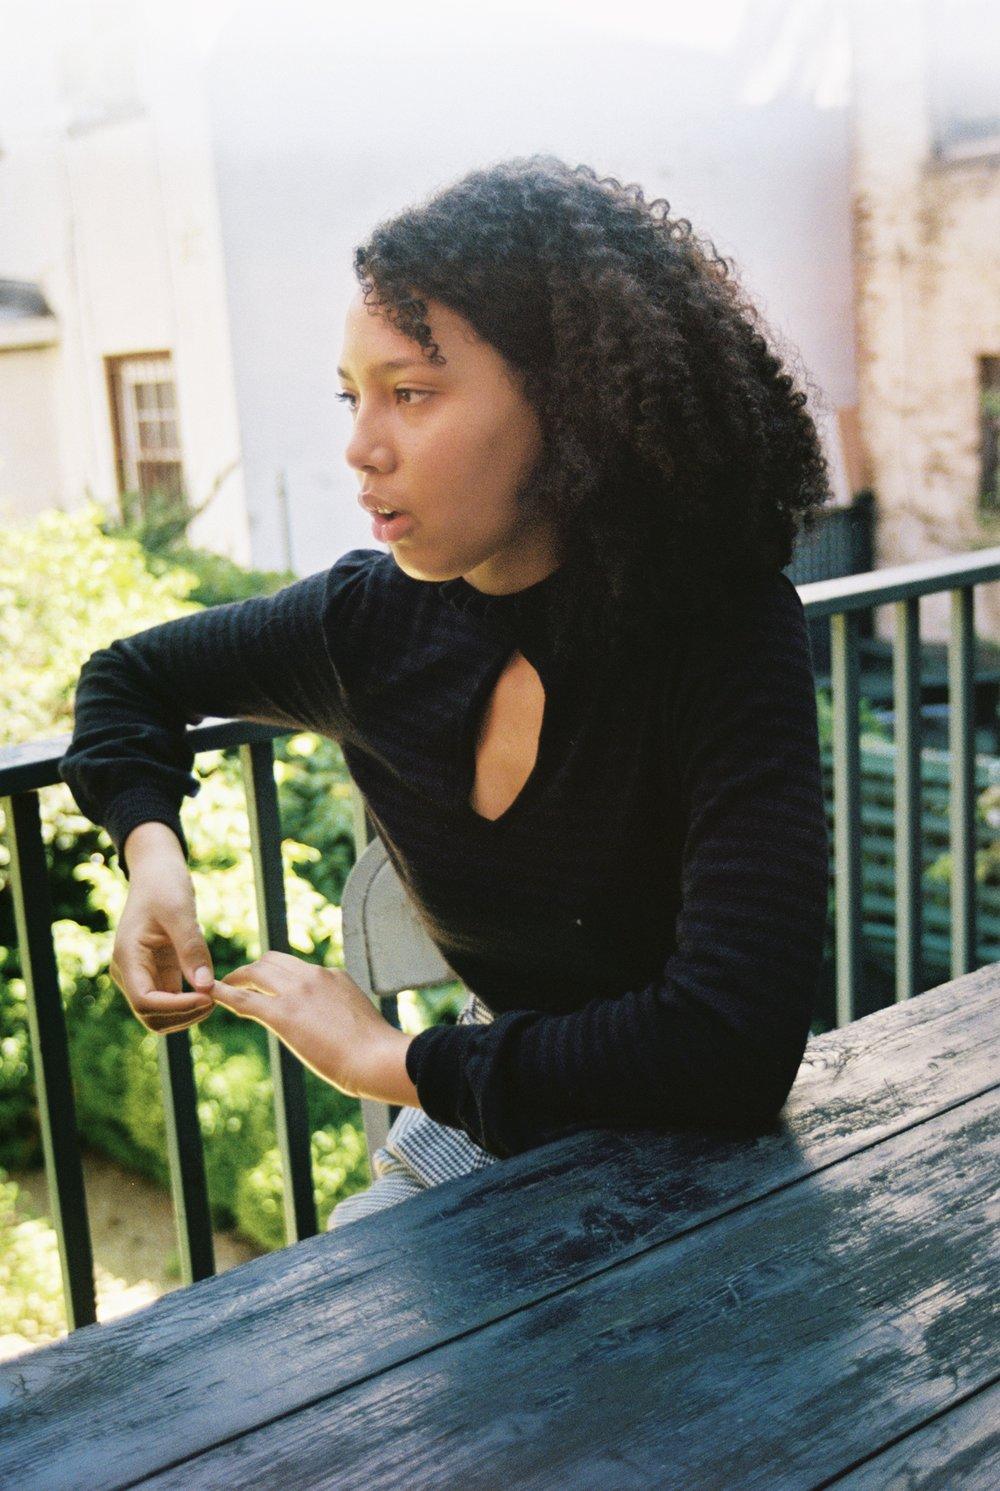 Alyssa captured by Natalie Yang.